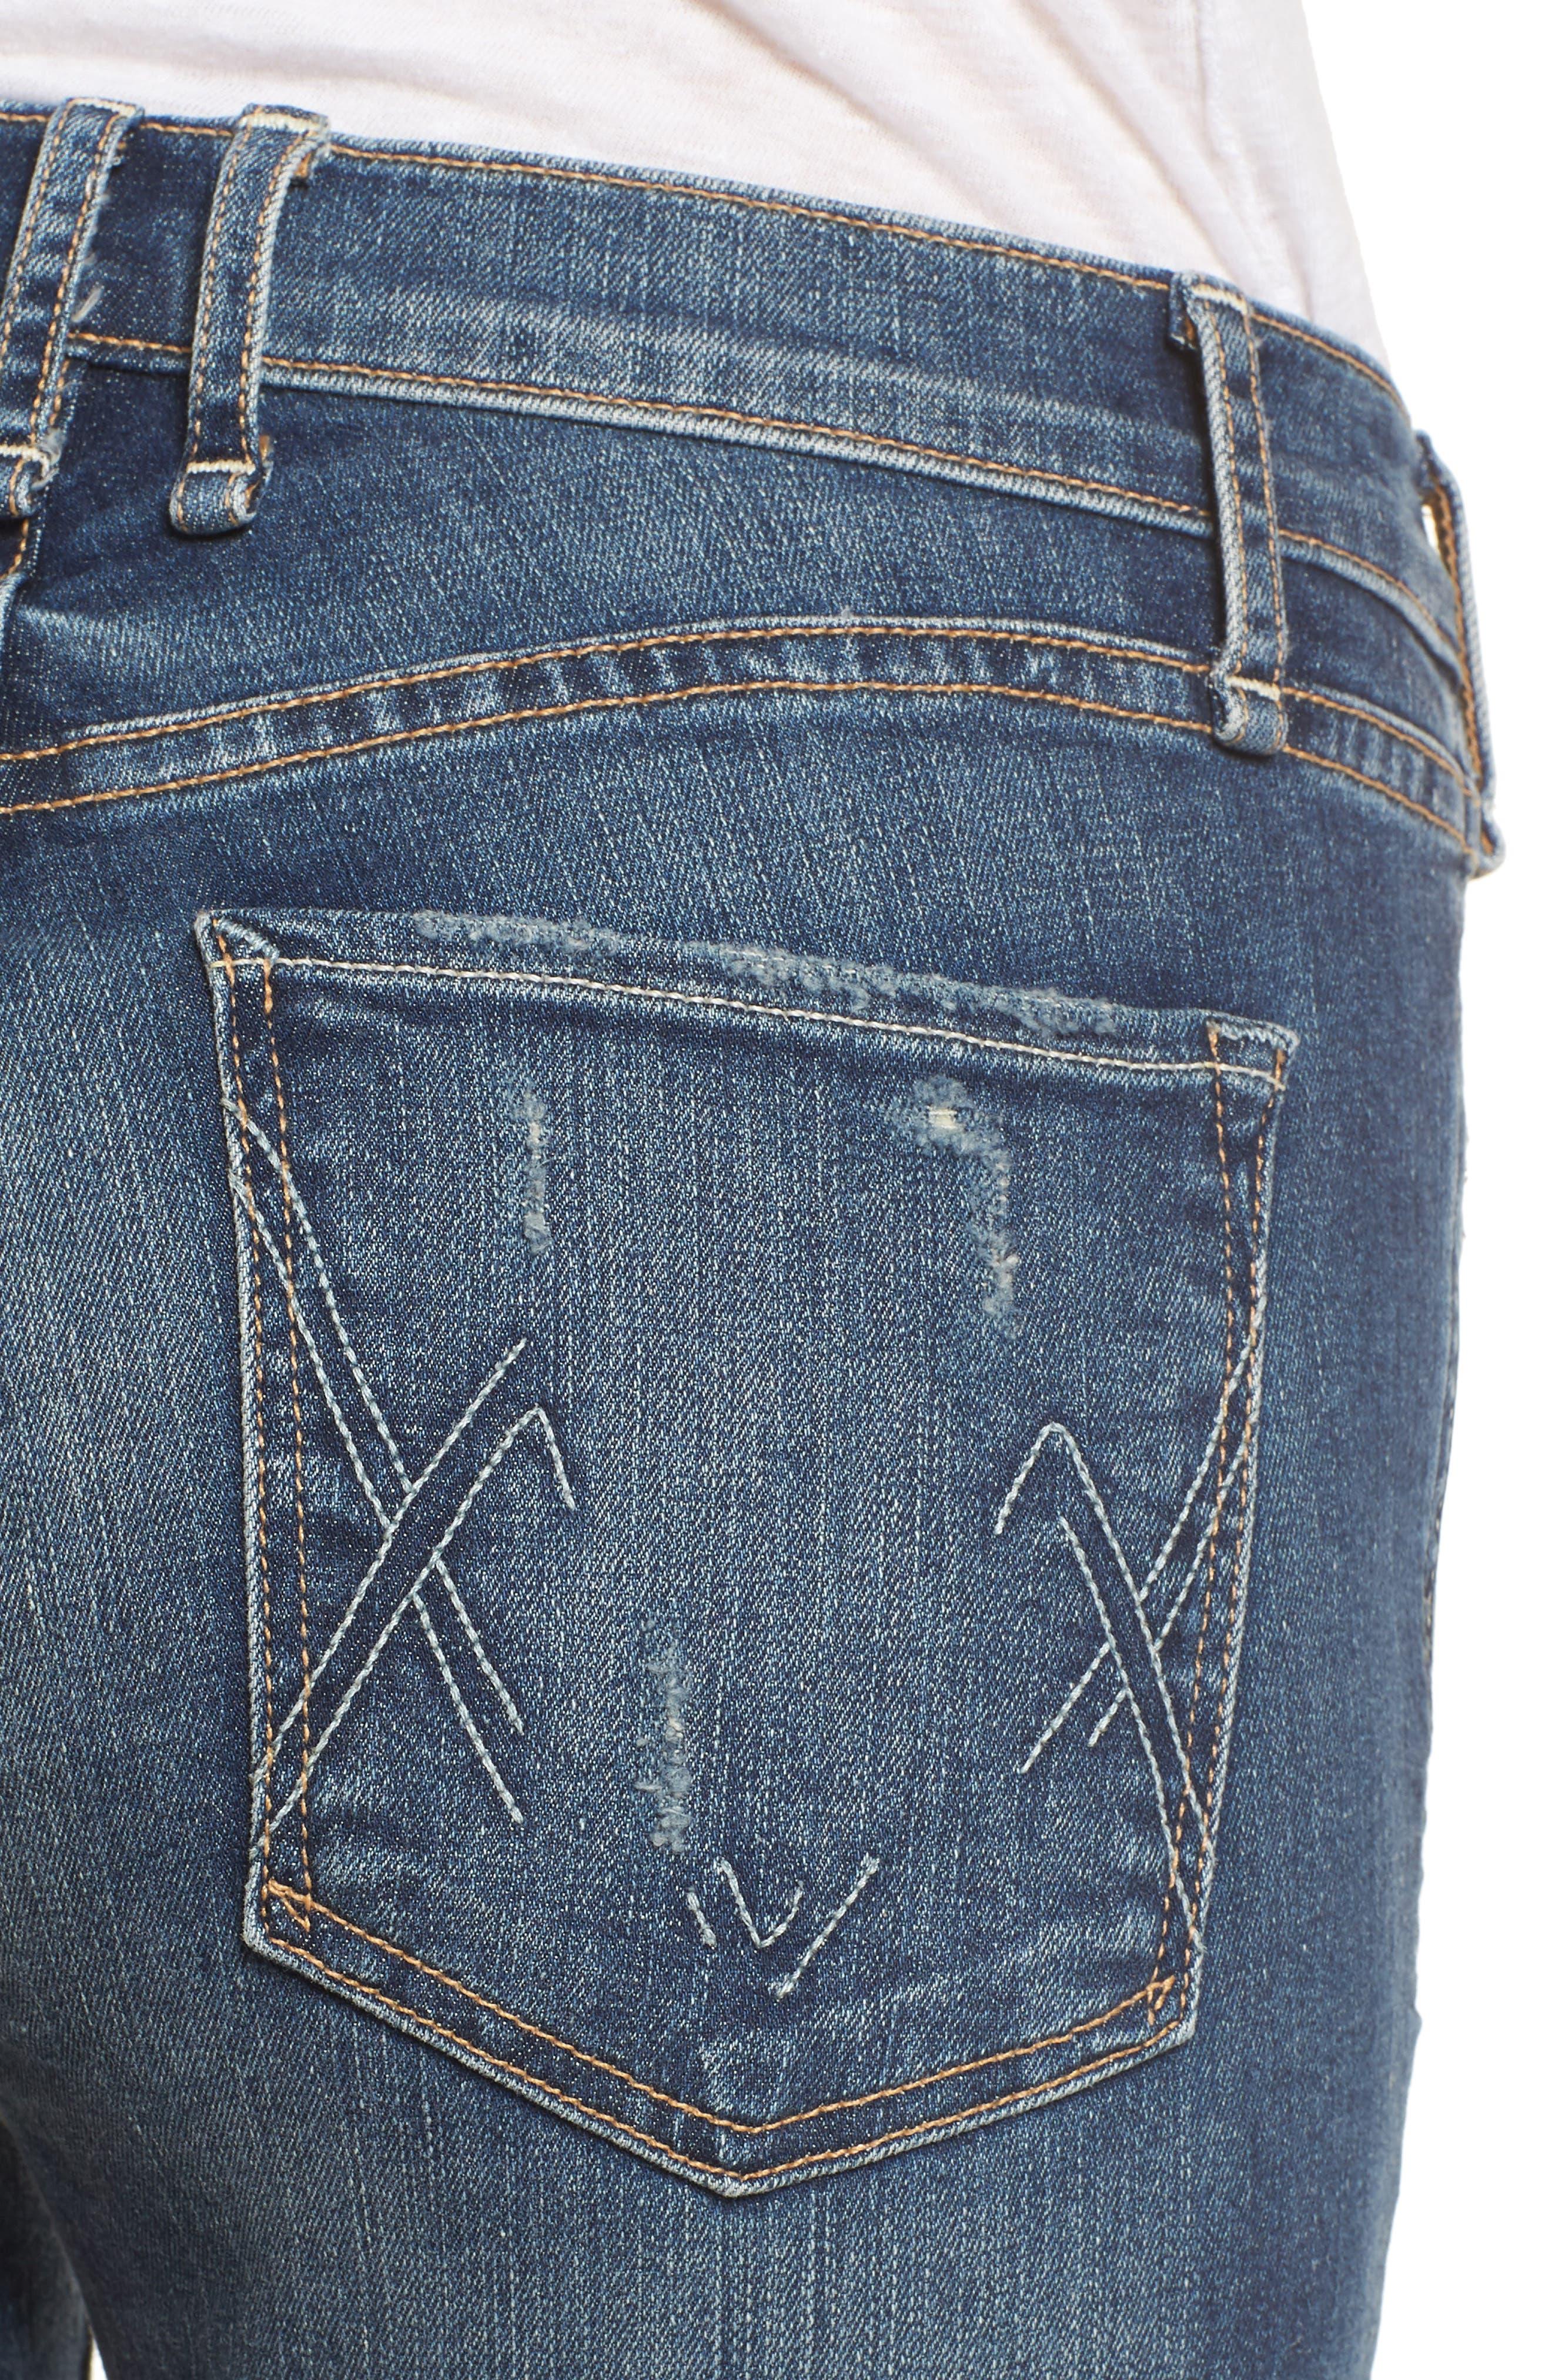 Newton High Rise Skinny Jeans,                             Alternate thumbnail 4, color,                             420